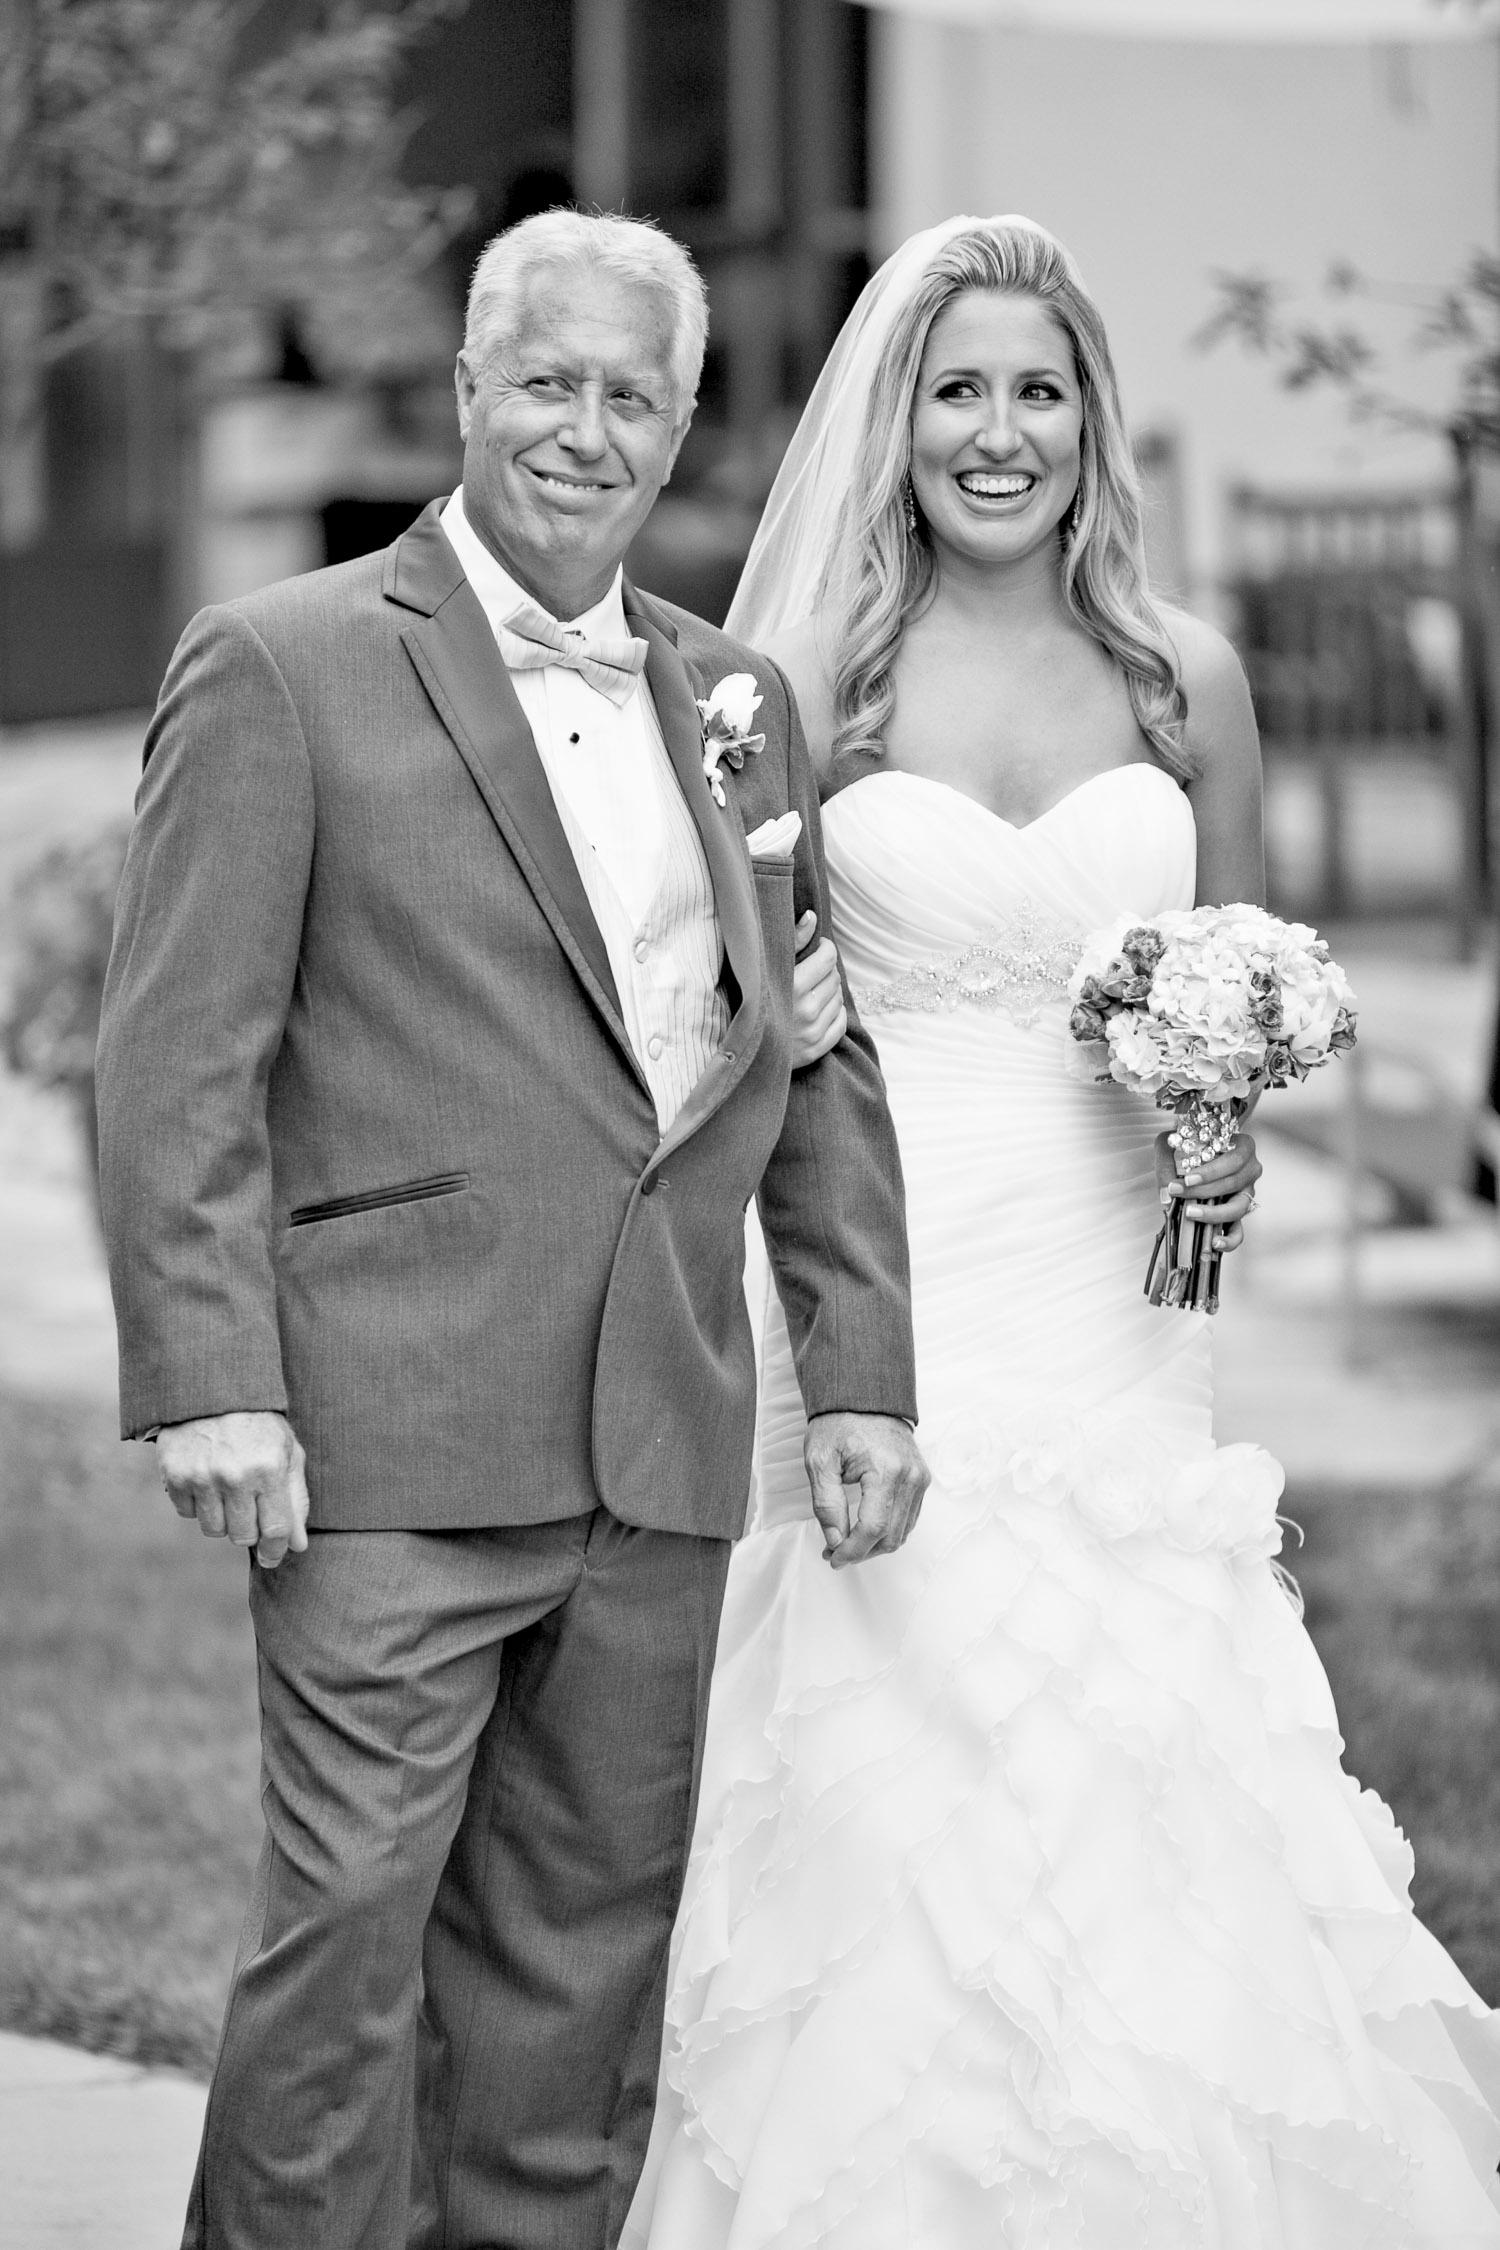 JMPHOTOART-Wedding-Photographer-141.jpg